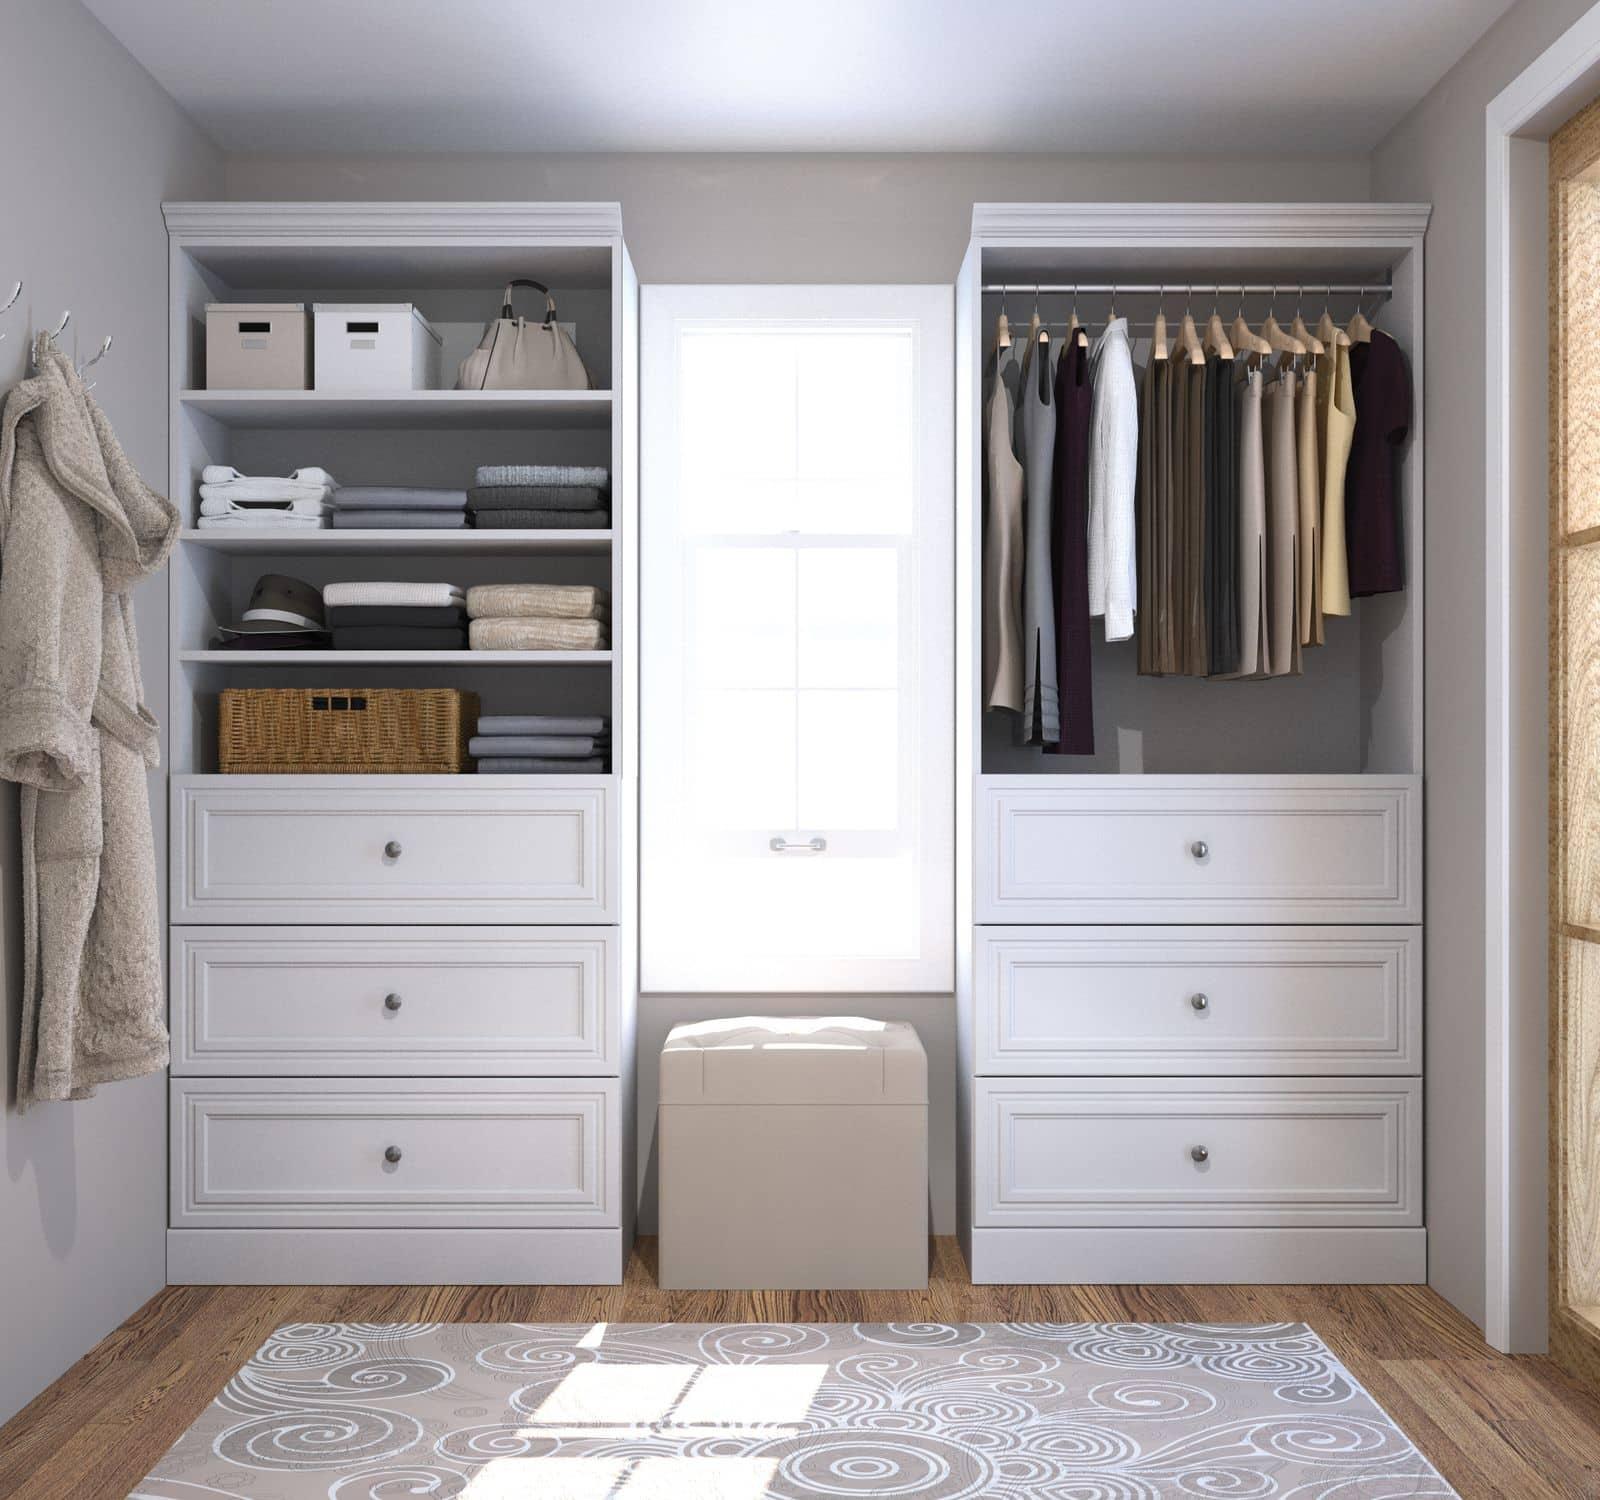 Bestar closet organizers